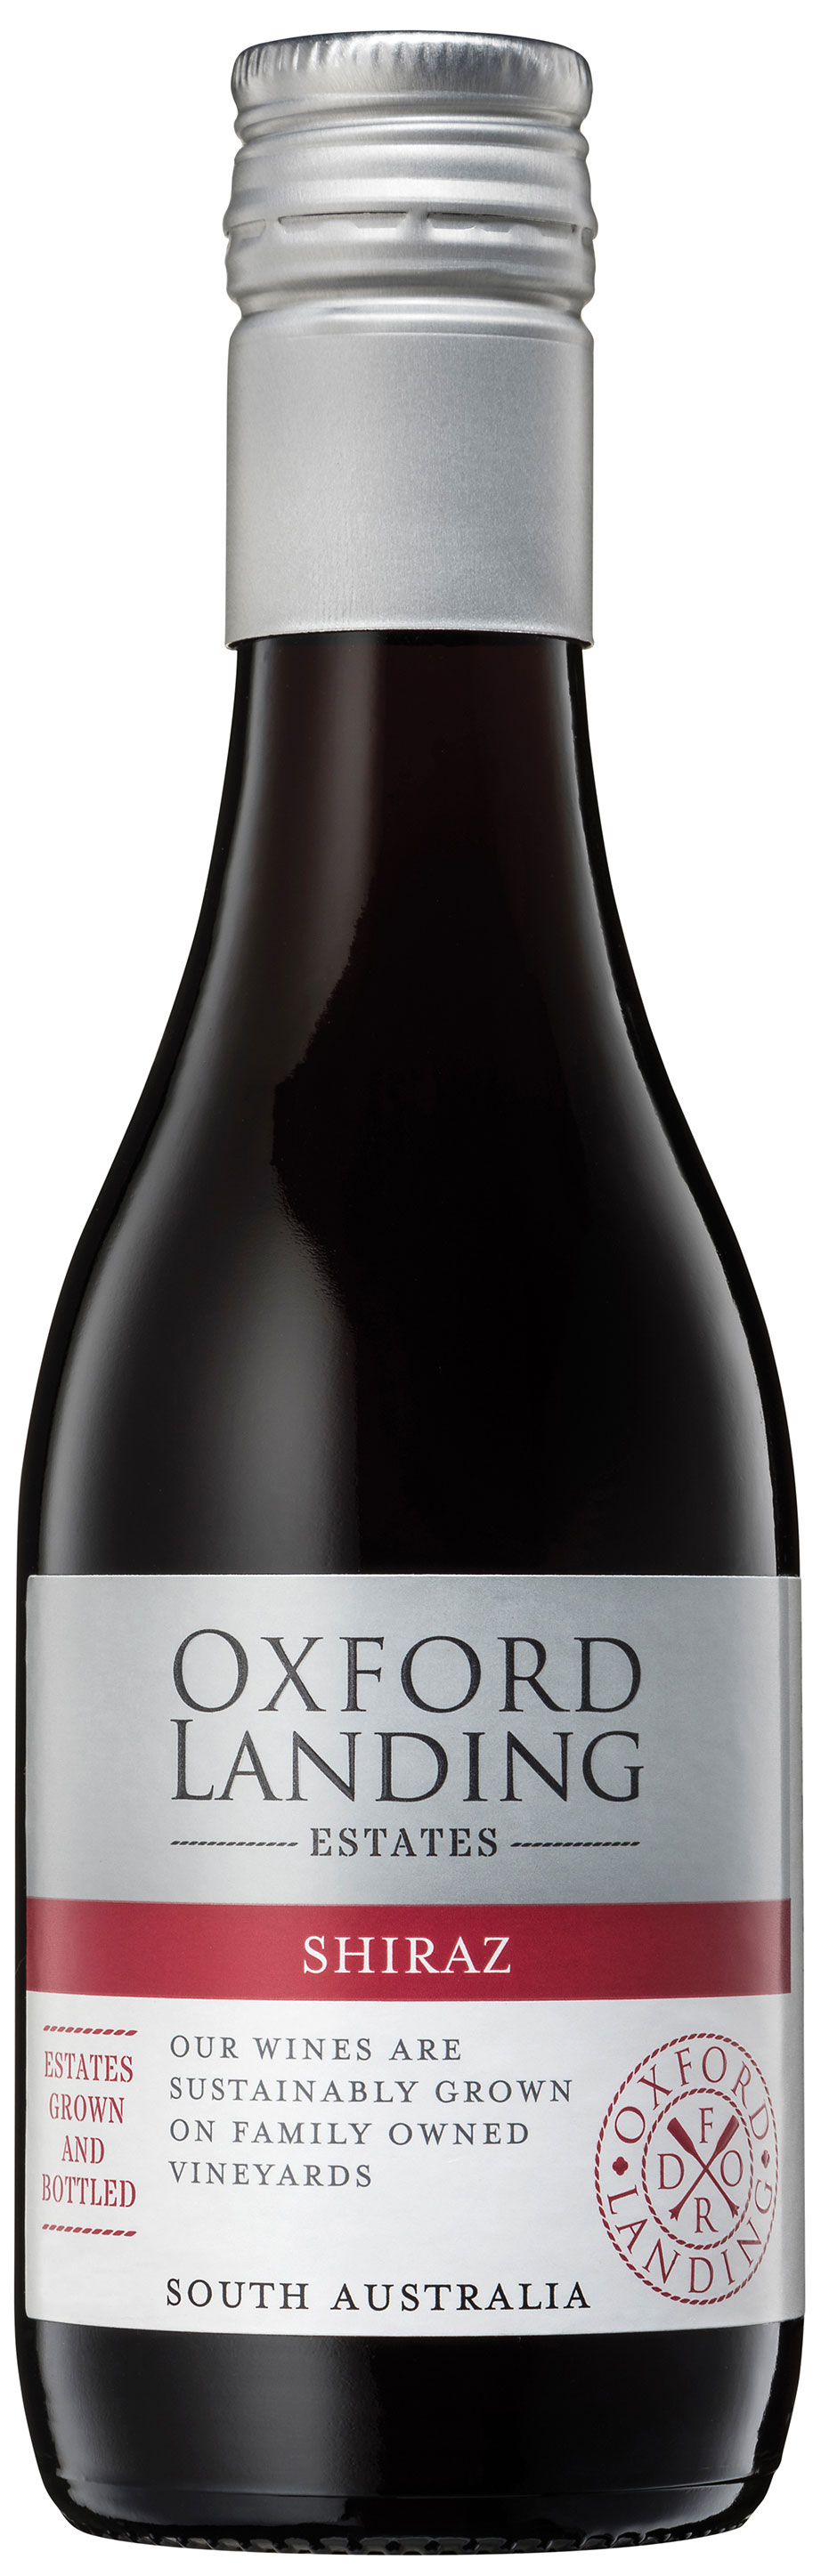 https://vinocorpperu.com/images/vinos/oxfordlanding/oxford_landing_estates_shiraz_2016.jpg